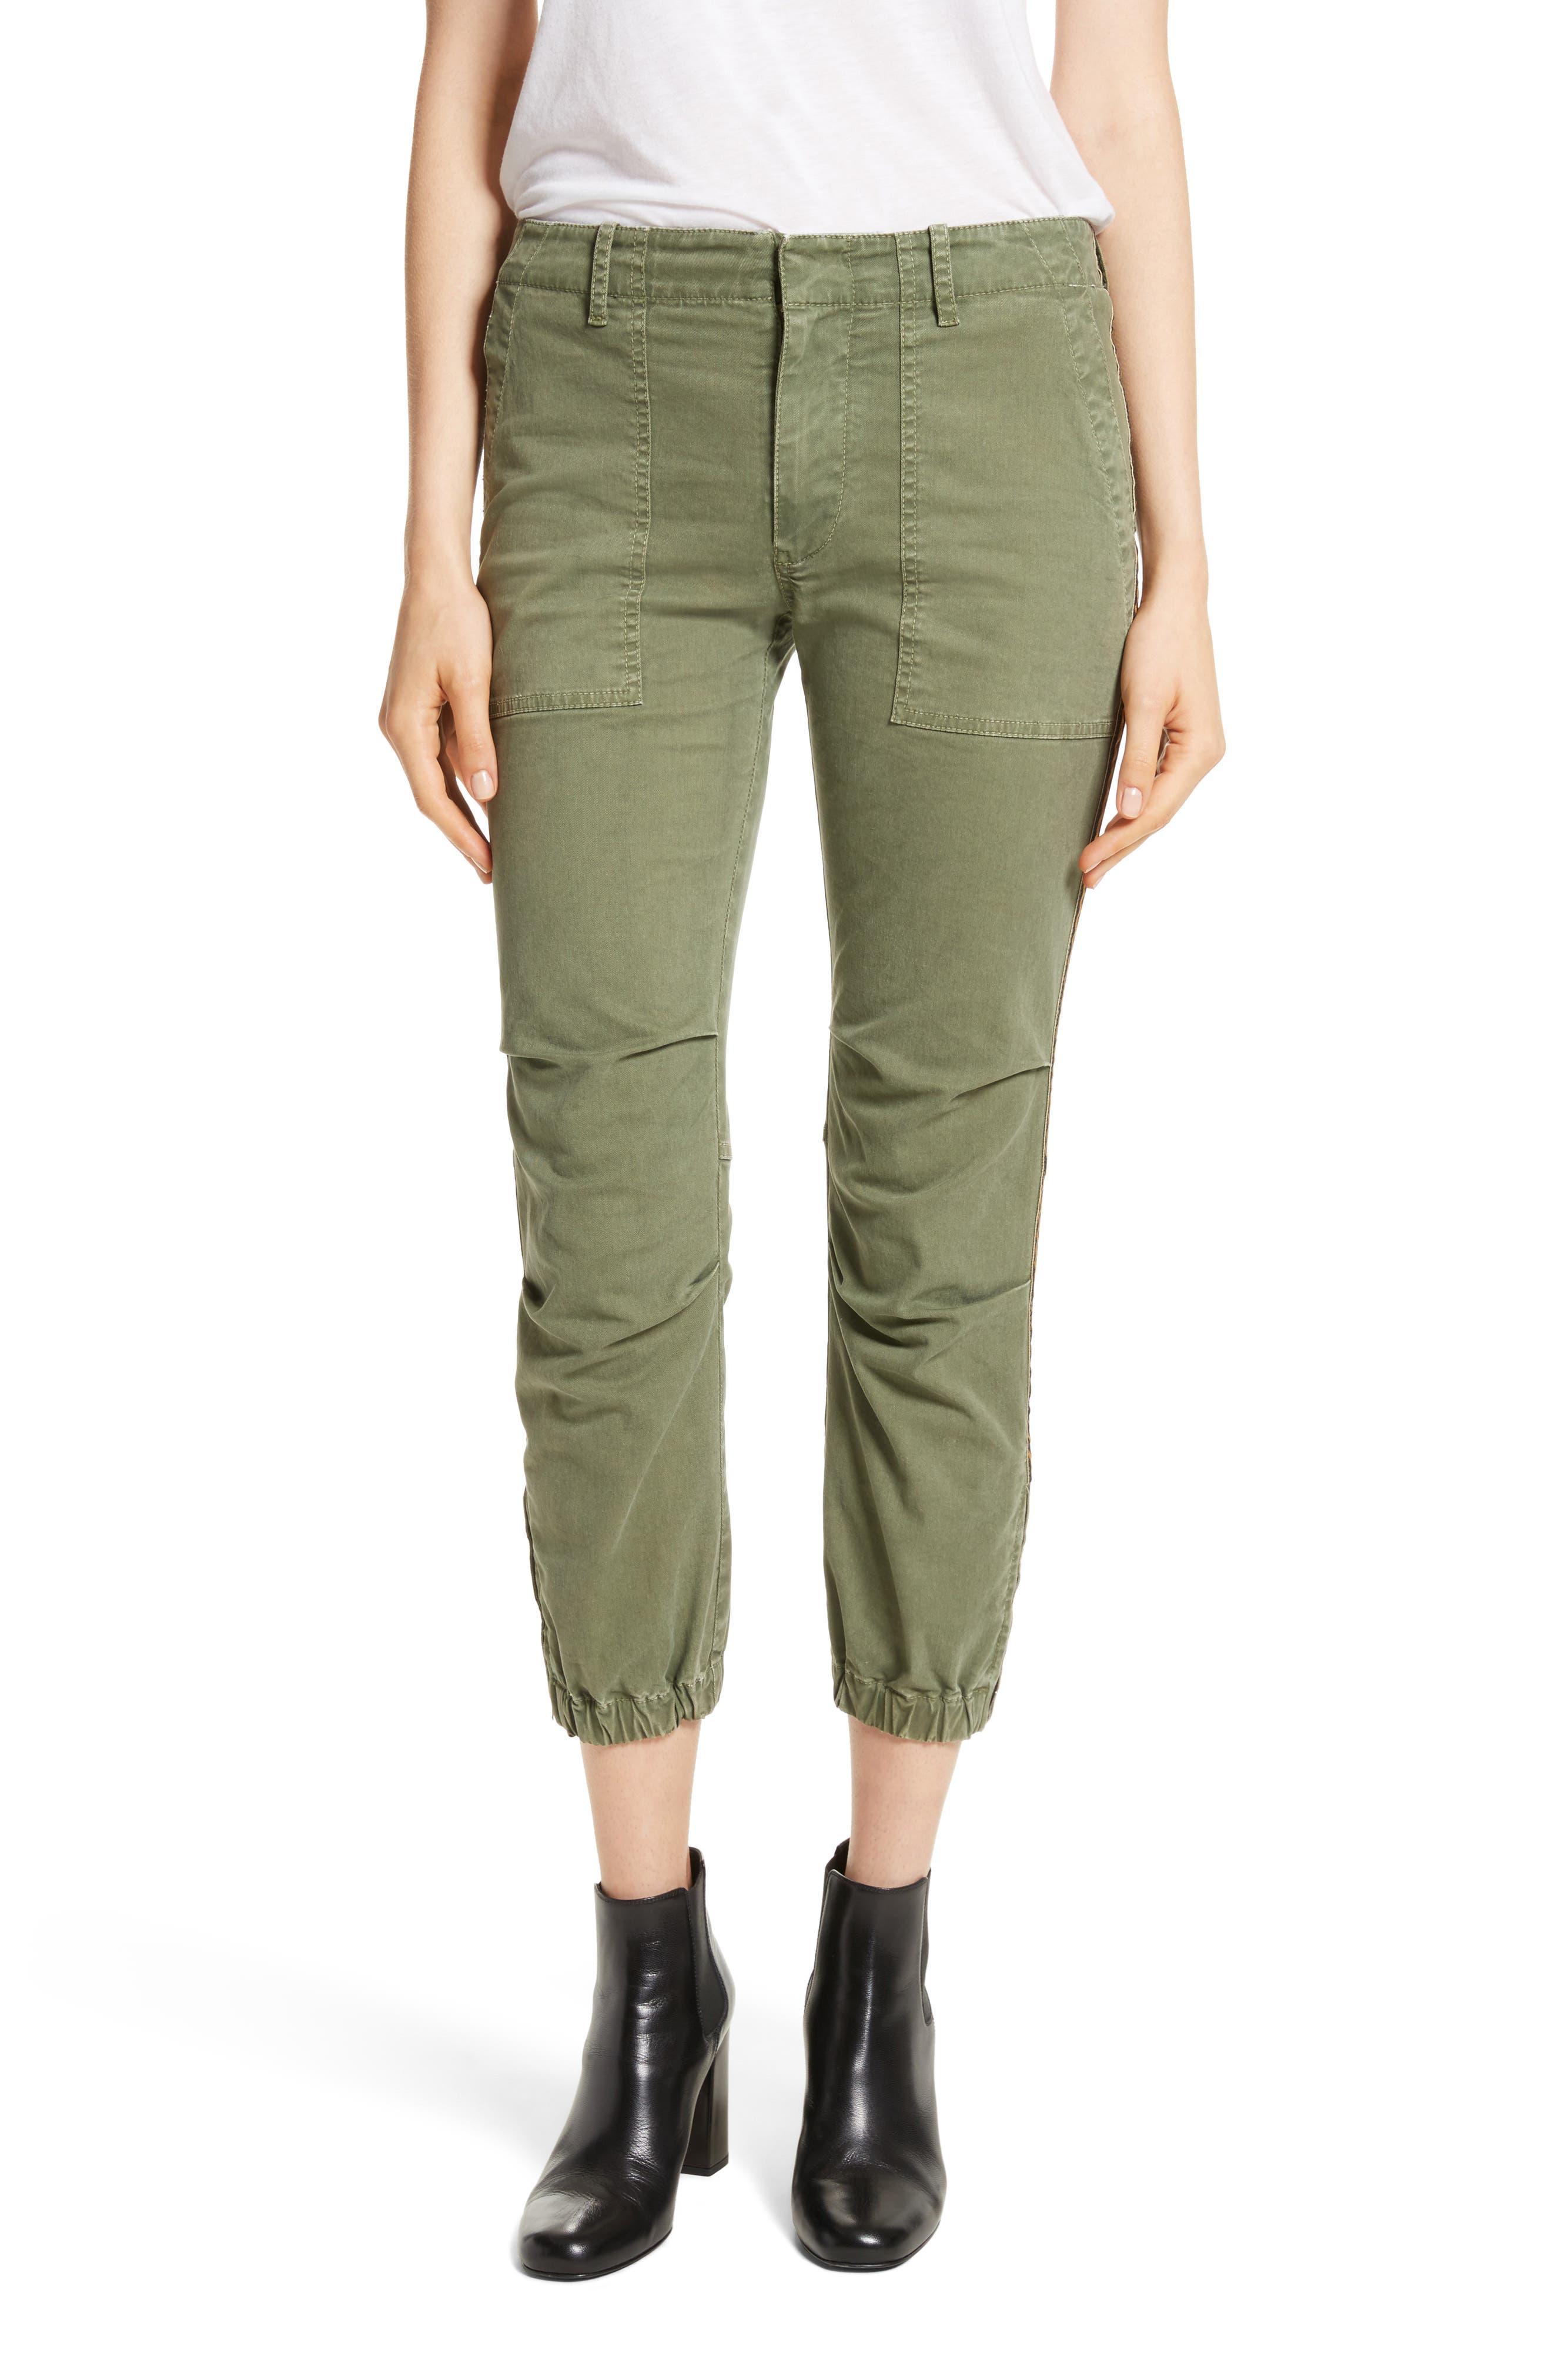 French Crop Military Pants,                             Main thumbnail 1, color,                             Camo